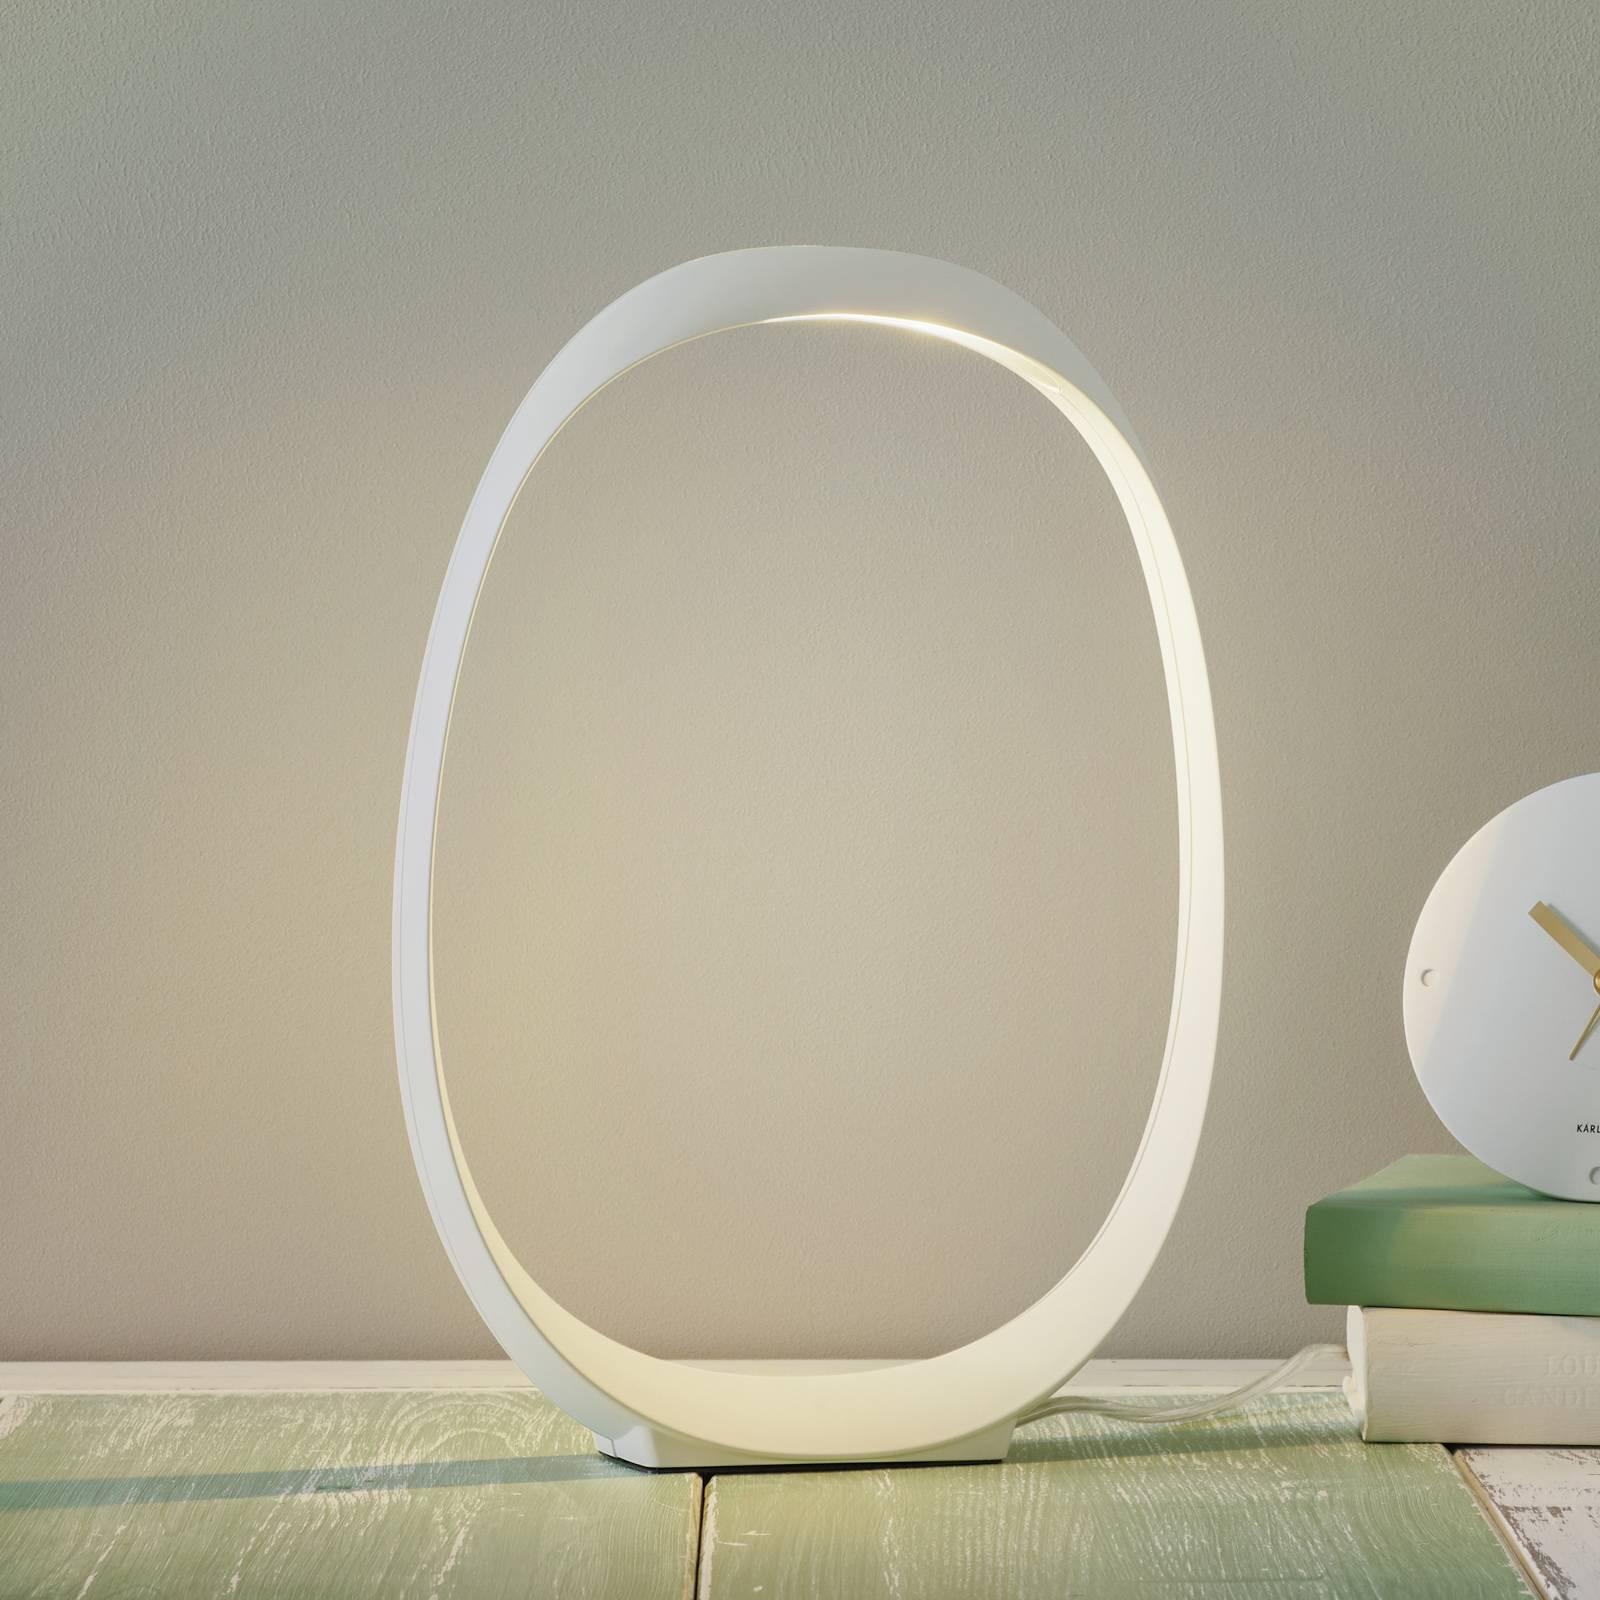 Foscarini Anisha piccola LED-Tischleuchte, 32cm